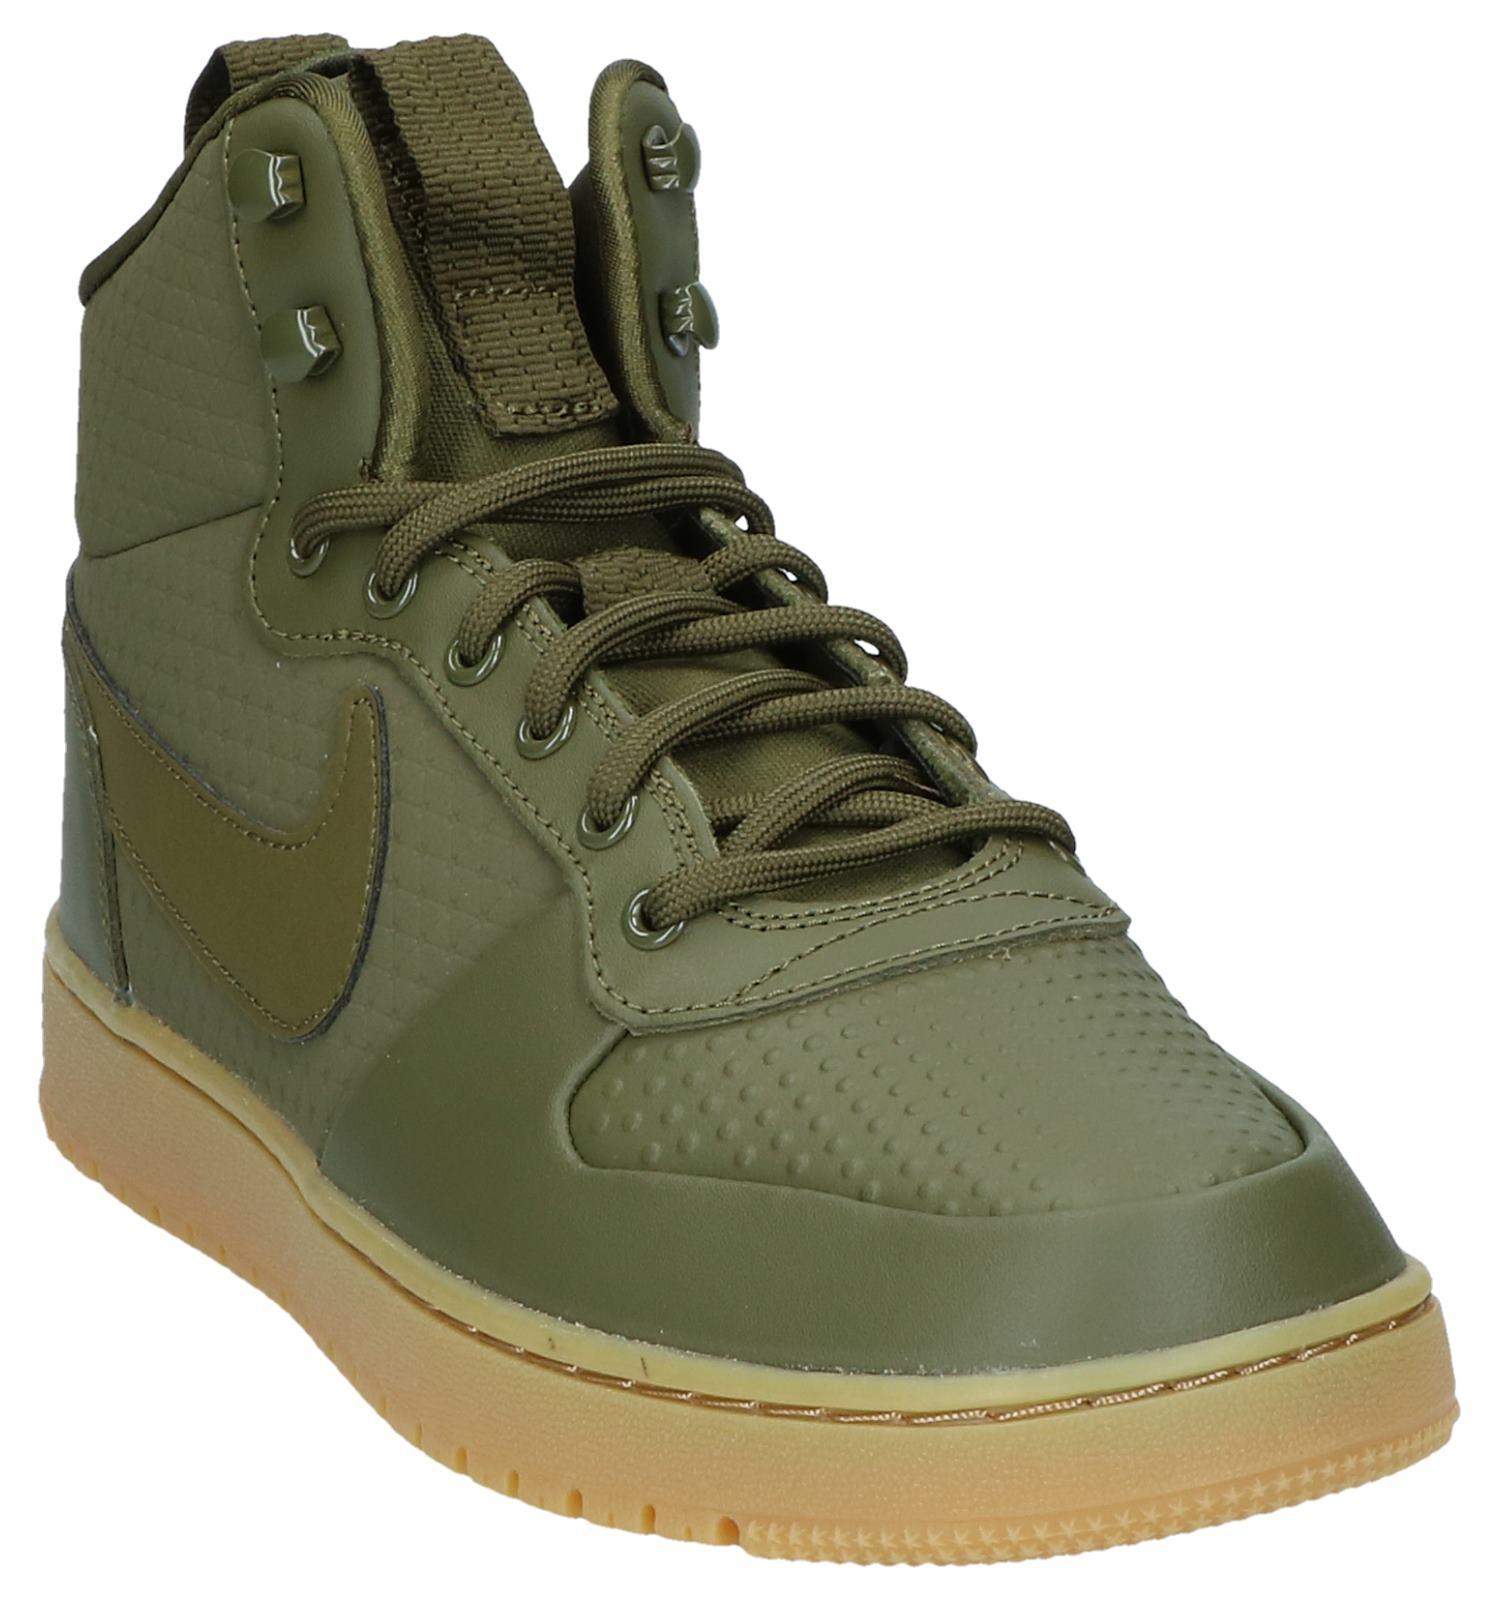 8ccae42b2ec Kaki Hoge Sneakers Nike Ebernon   TORFS.BE   Gratis verzend en retour